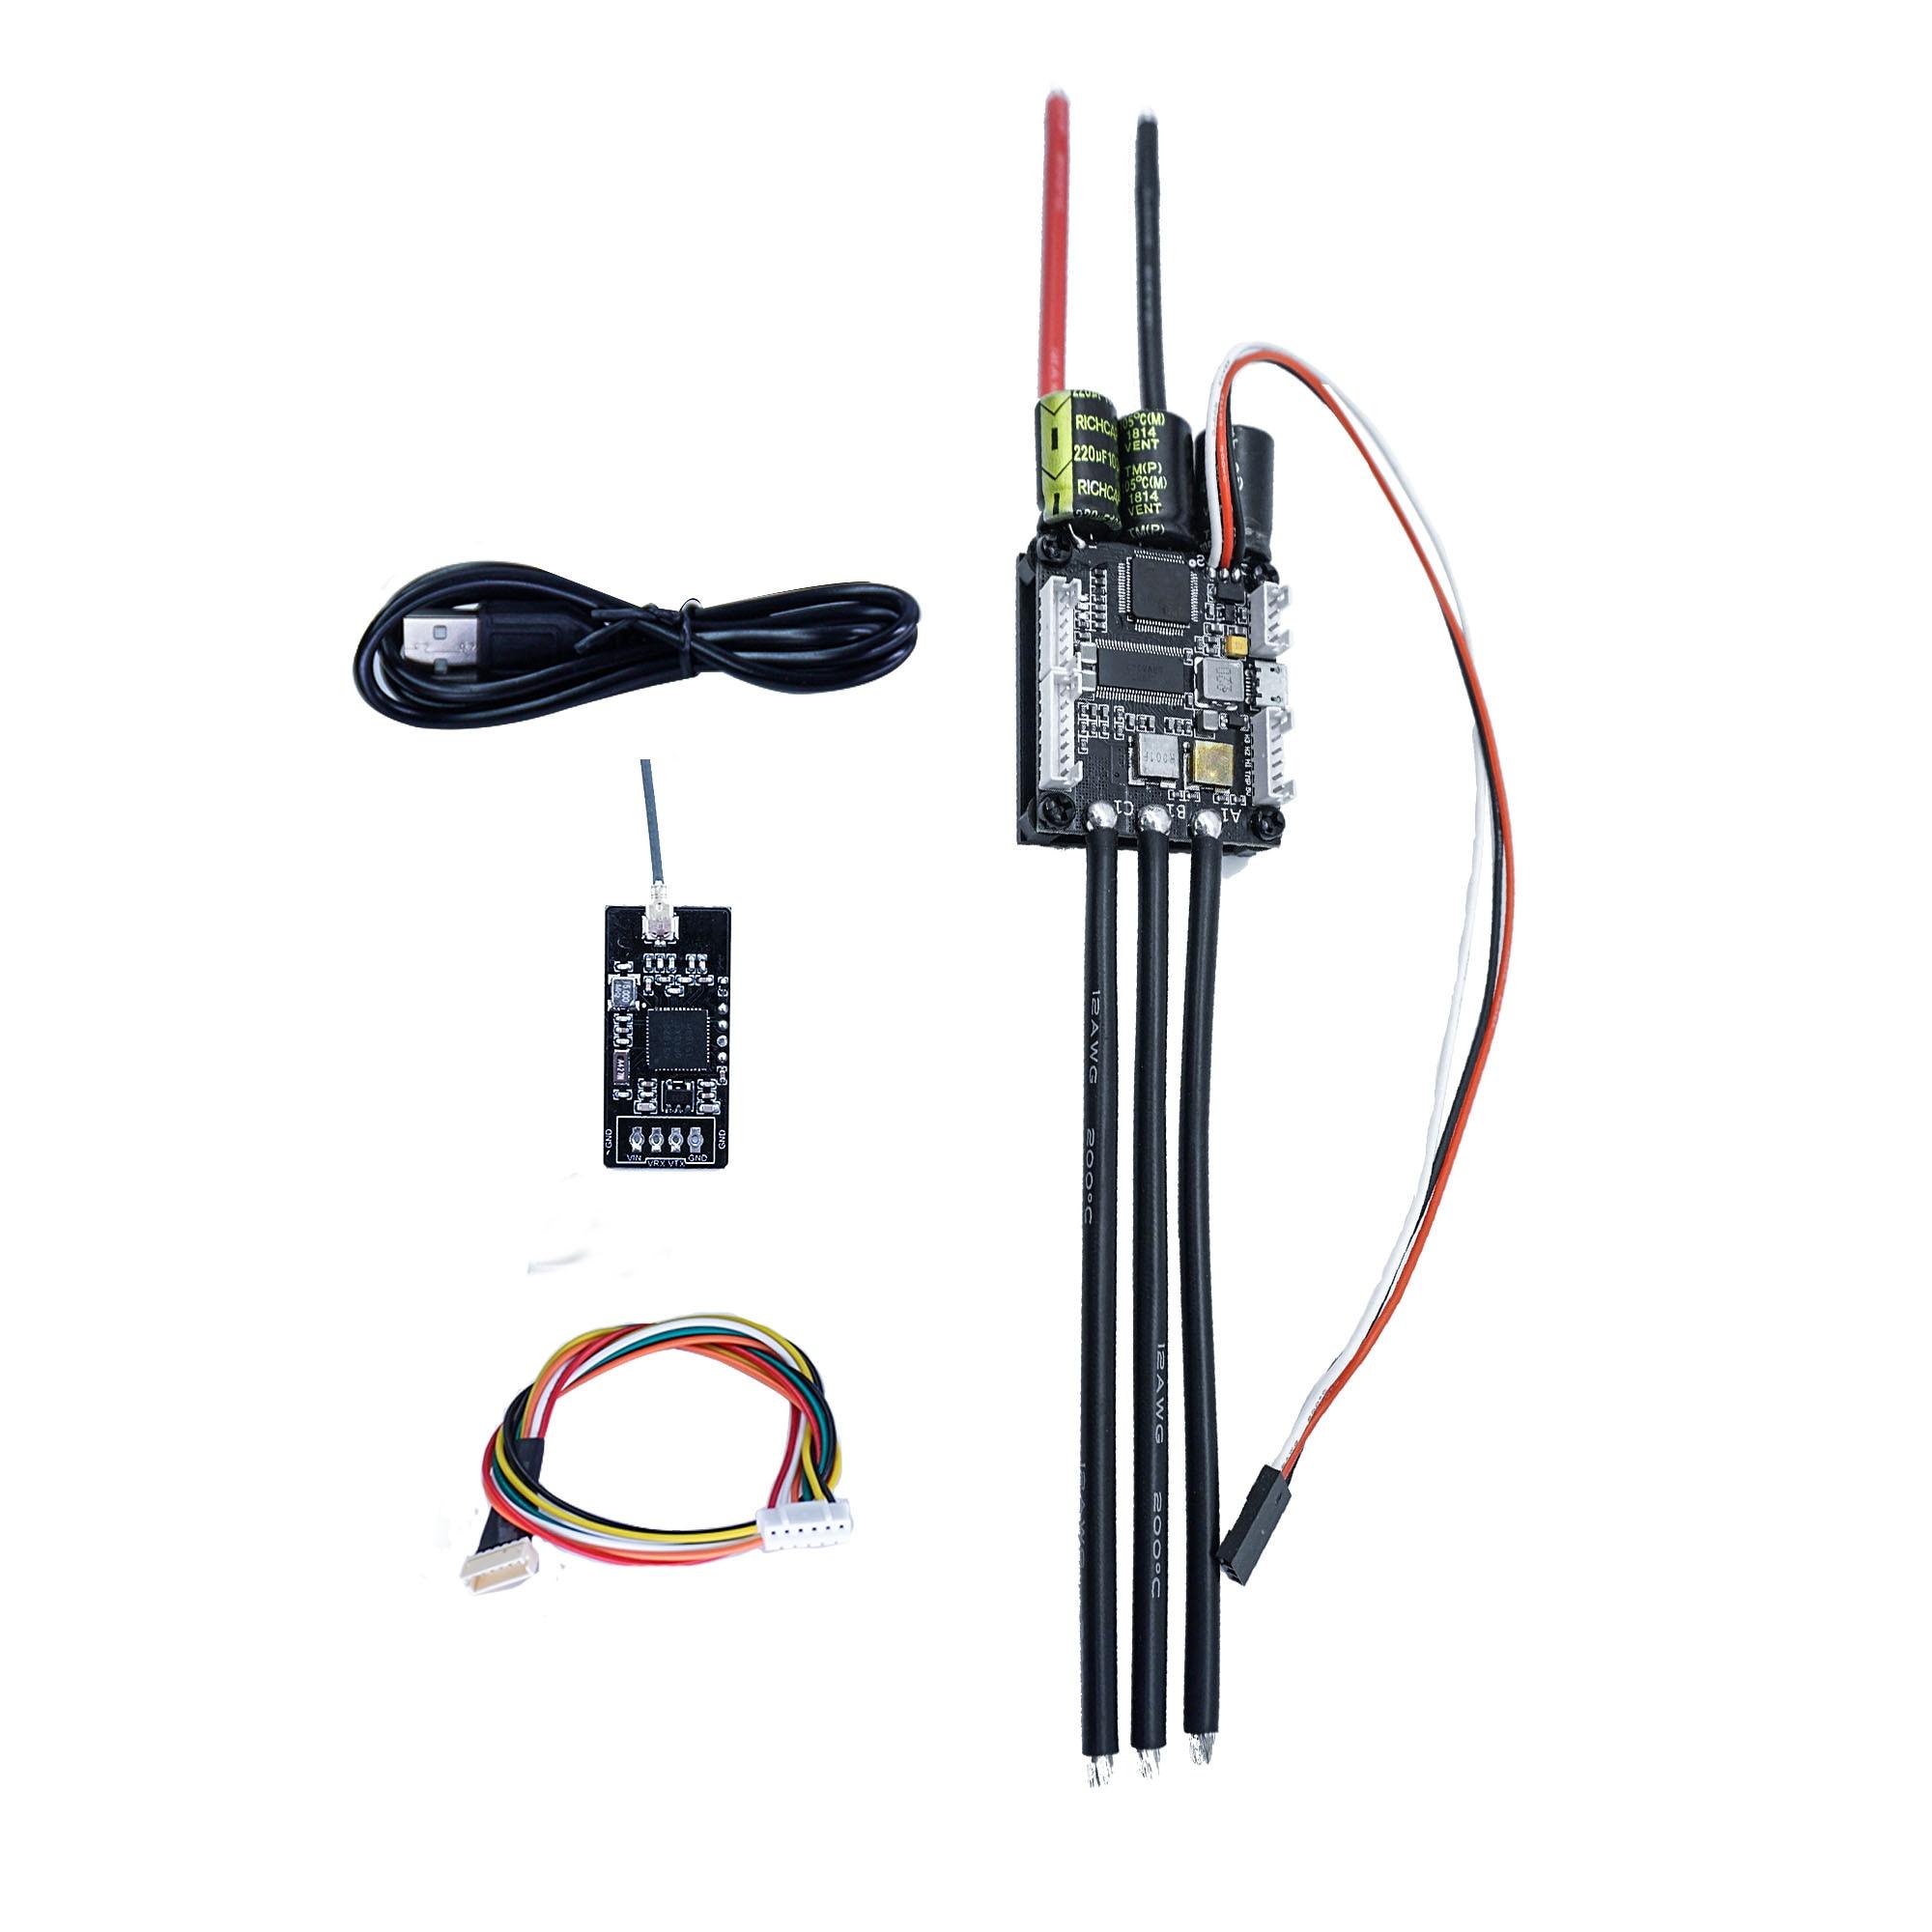 Skateboard Esc 50A Vesc 4.20 + Bluetooth Module Skate Eletrico 3-13s Latest Firmware Electric Speed Controller For Skateboard